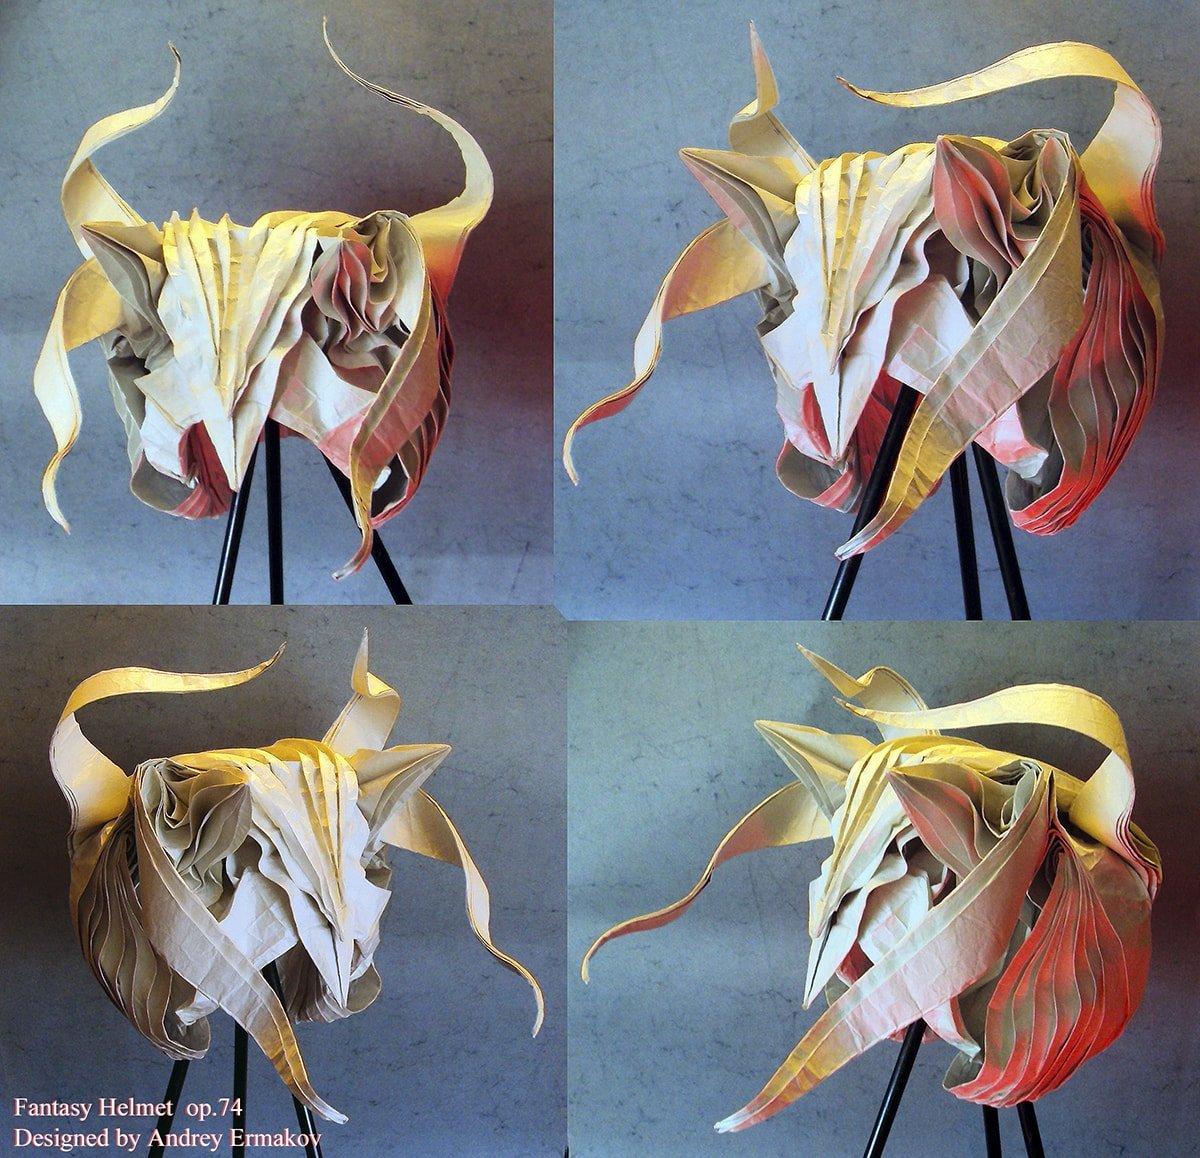 Fantasy Helmet by Andrey Ermakov